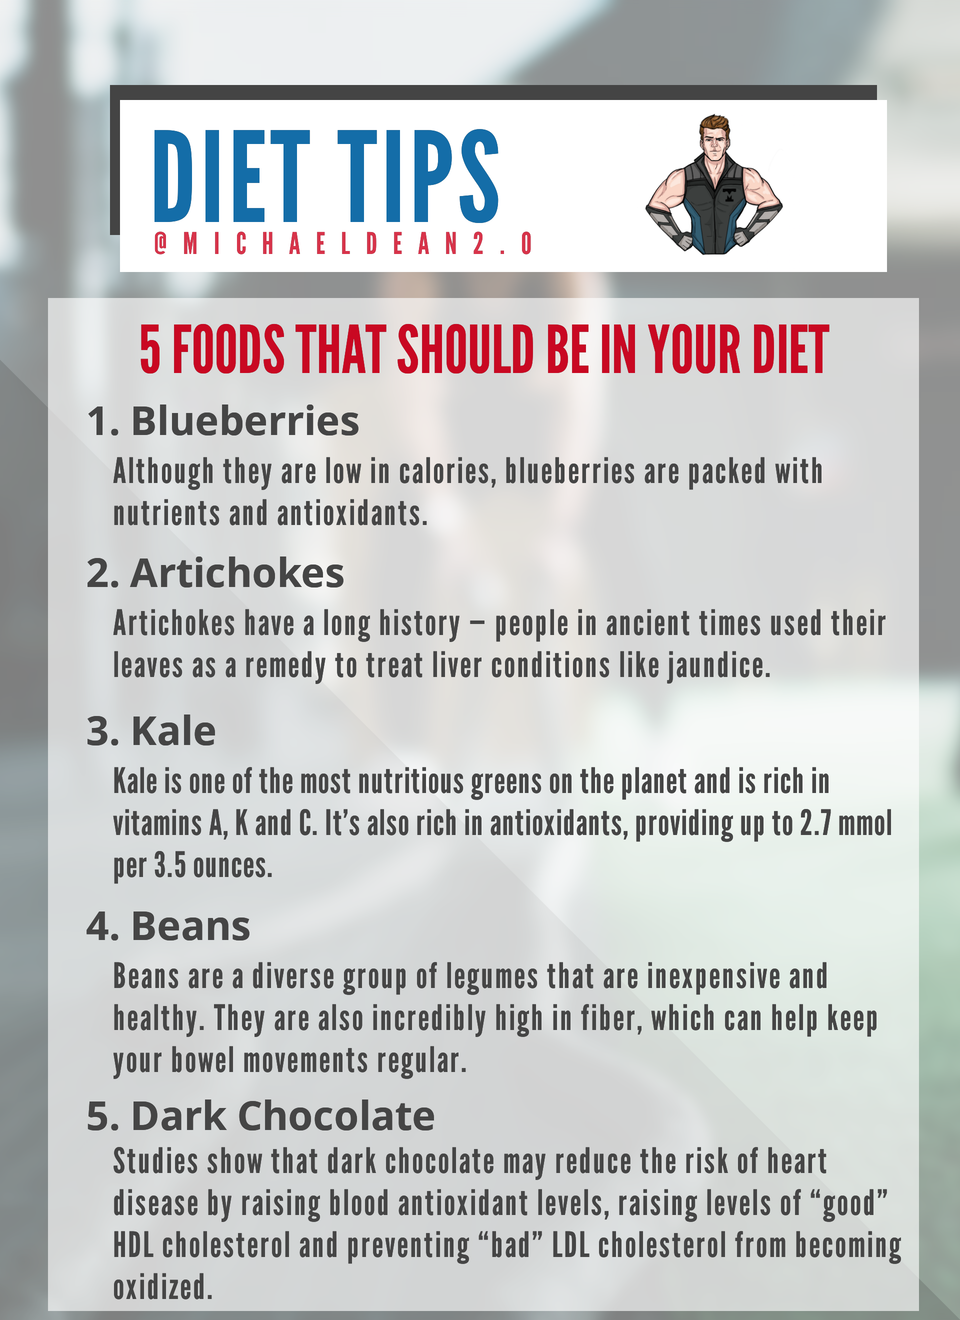 Diet tips 1